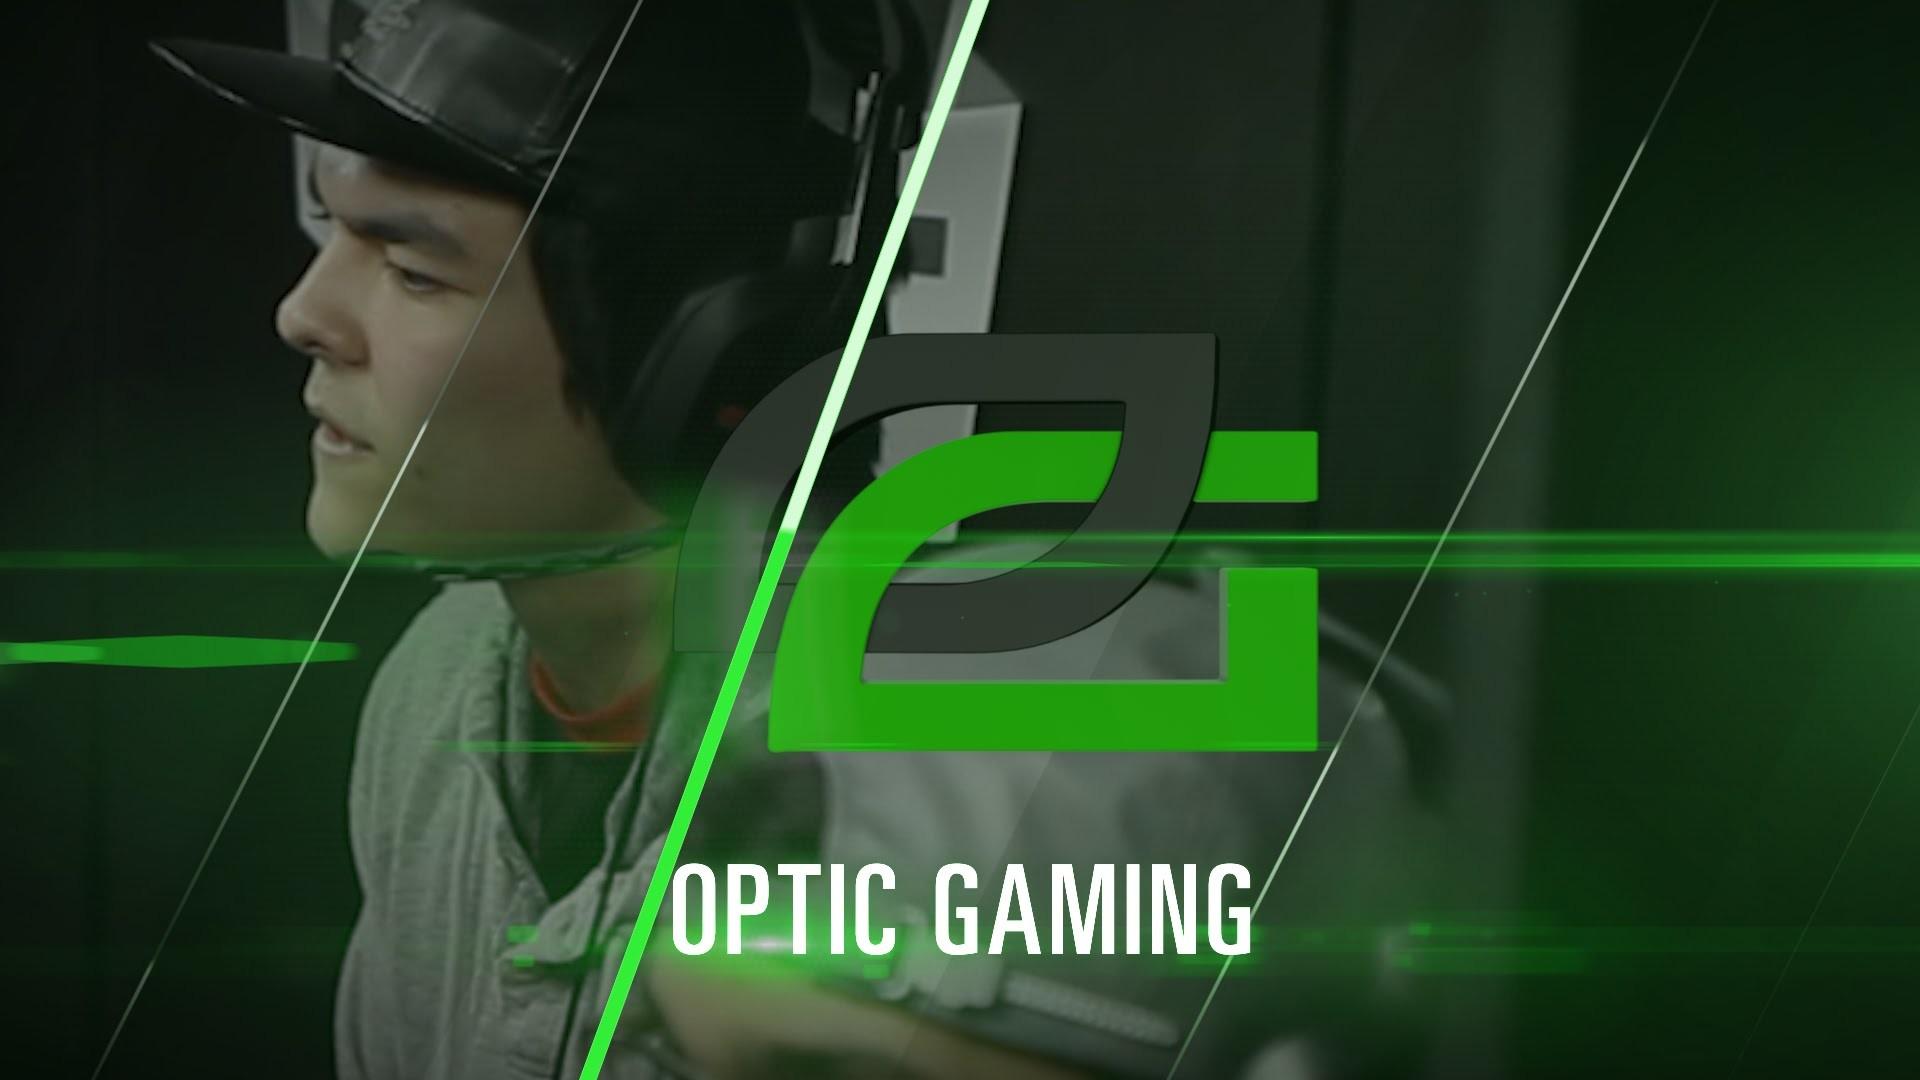 #RoadToXgames – Optic Gaming Profile – YouTube